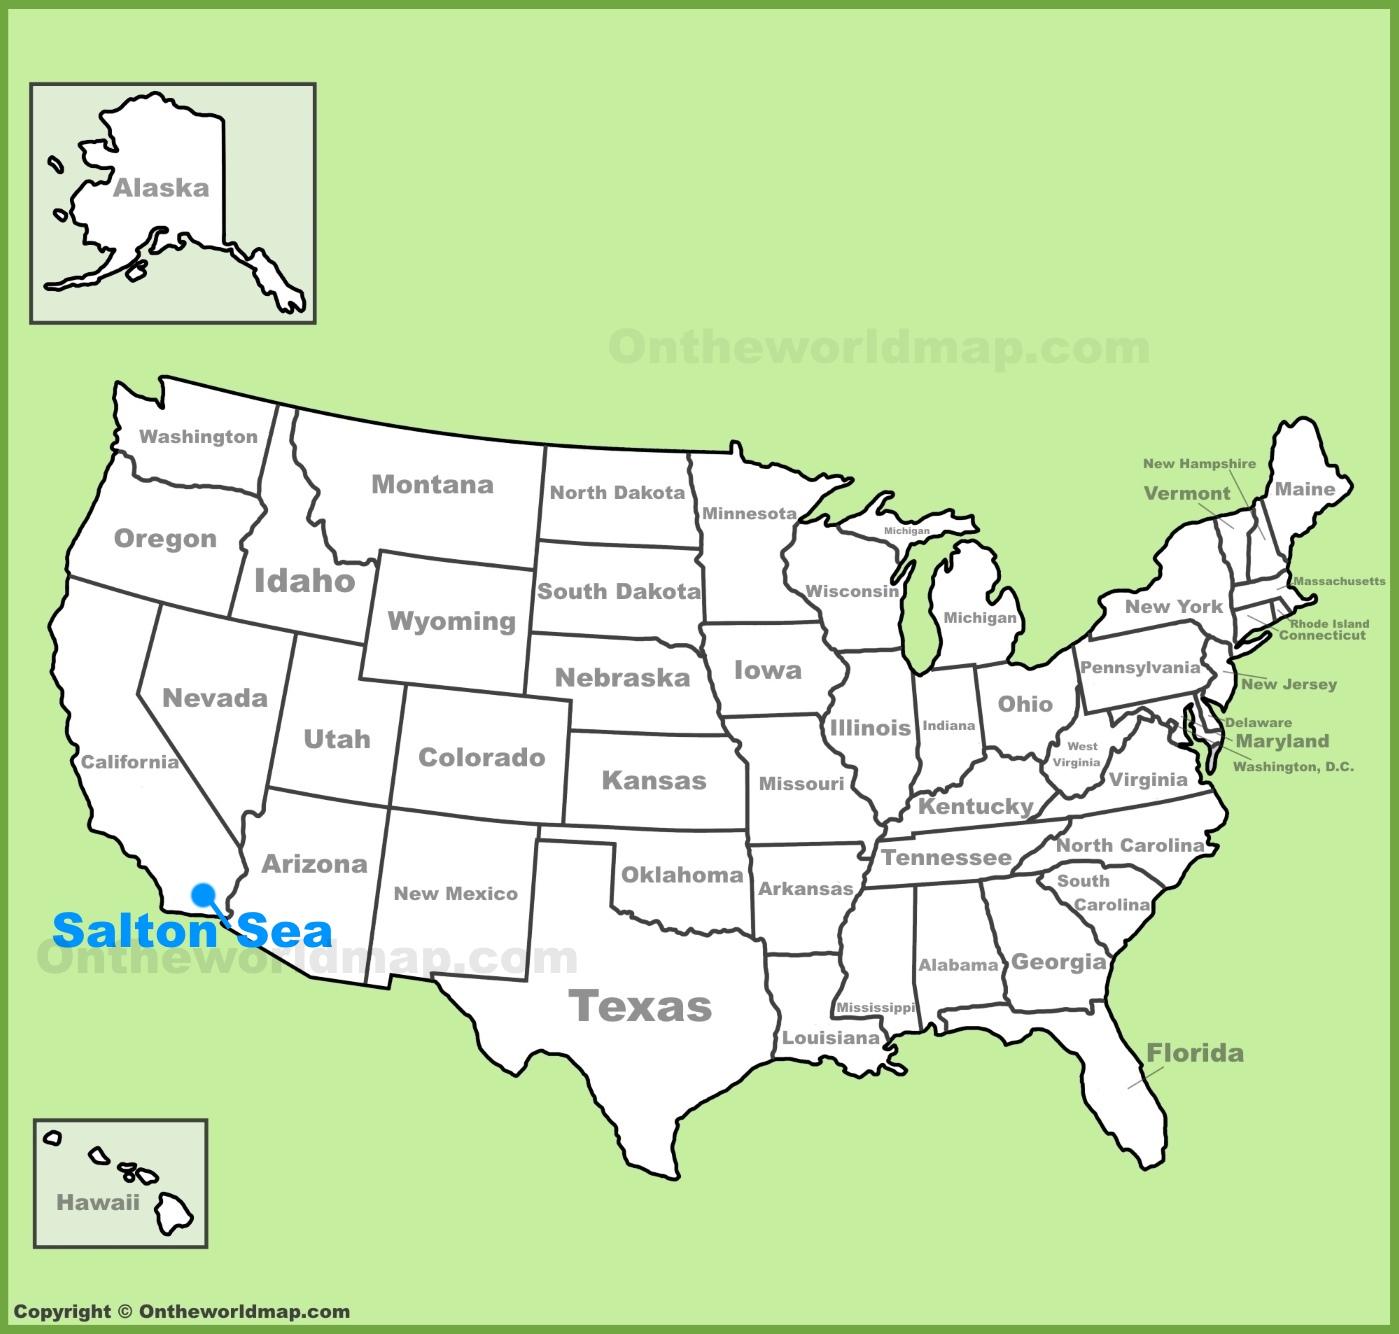 Salton Sea location on the US Map